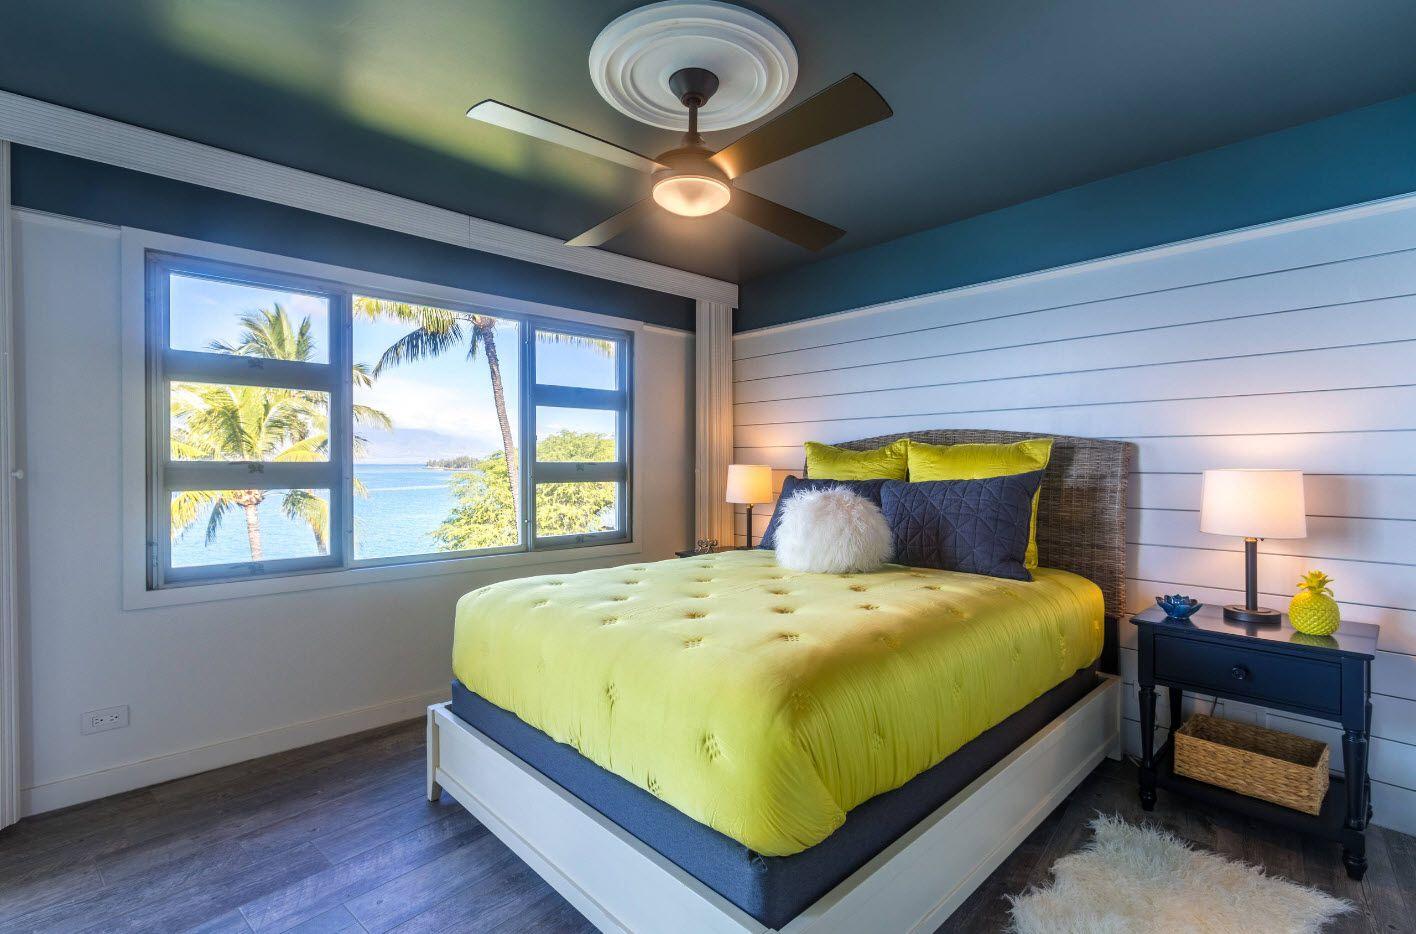 Sandwich platform bed in original Marine styled bedroom